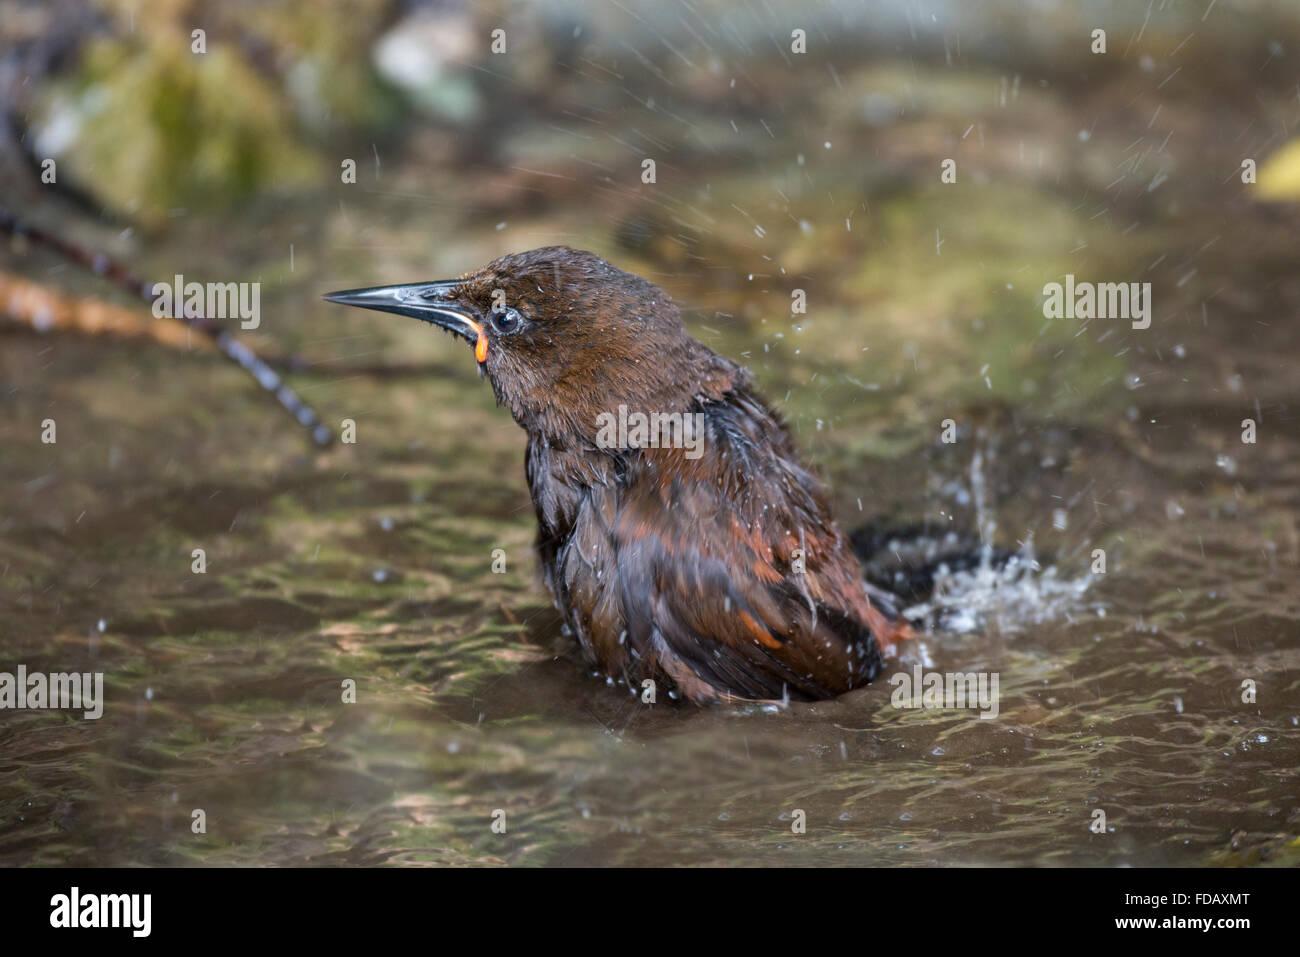 Neuseeland, Marlborough Sounds, Motuara Island aka Motu Ara. Raubtier-freie Insel Vogelschutzgebiet. Weibliche Südinsel Saddleback. Stockfoto